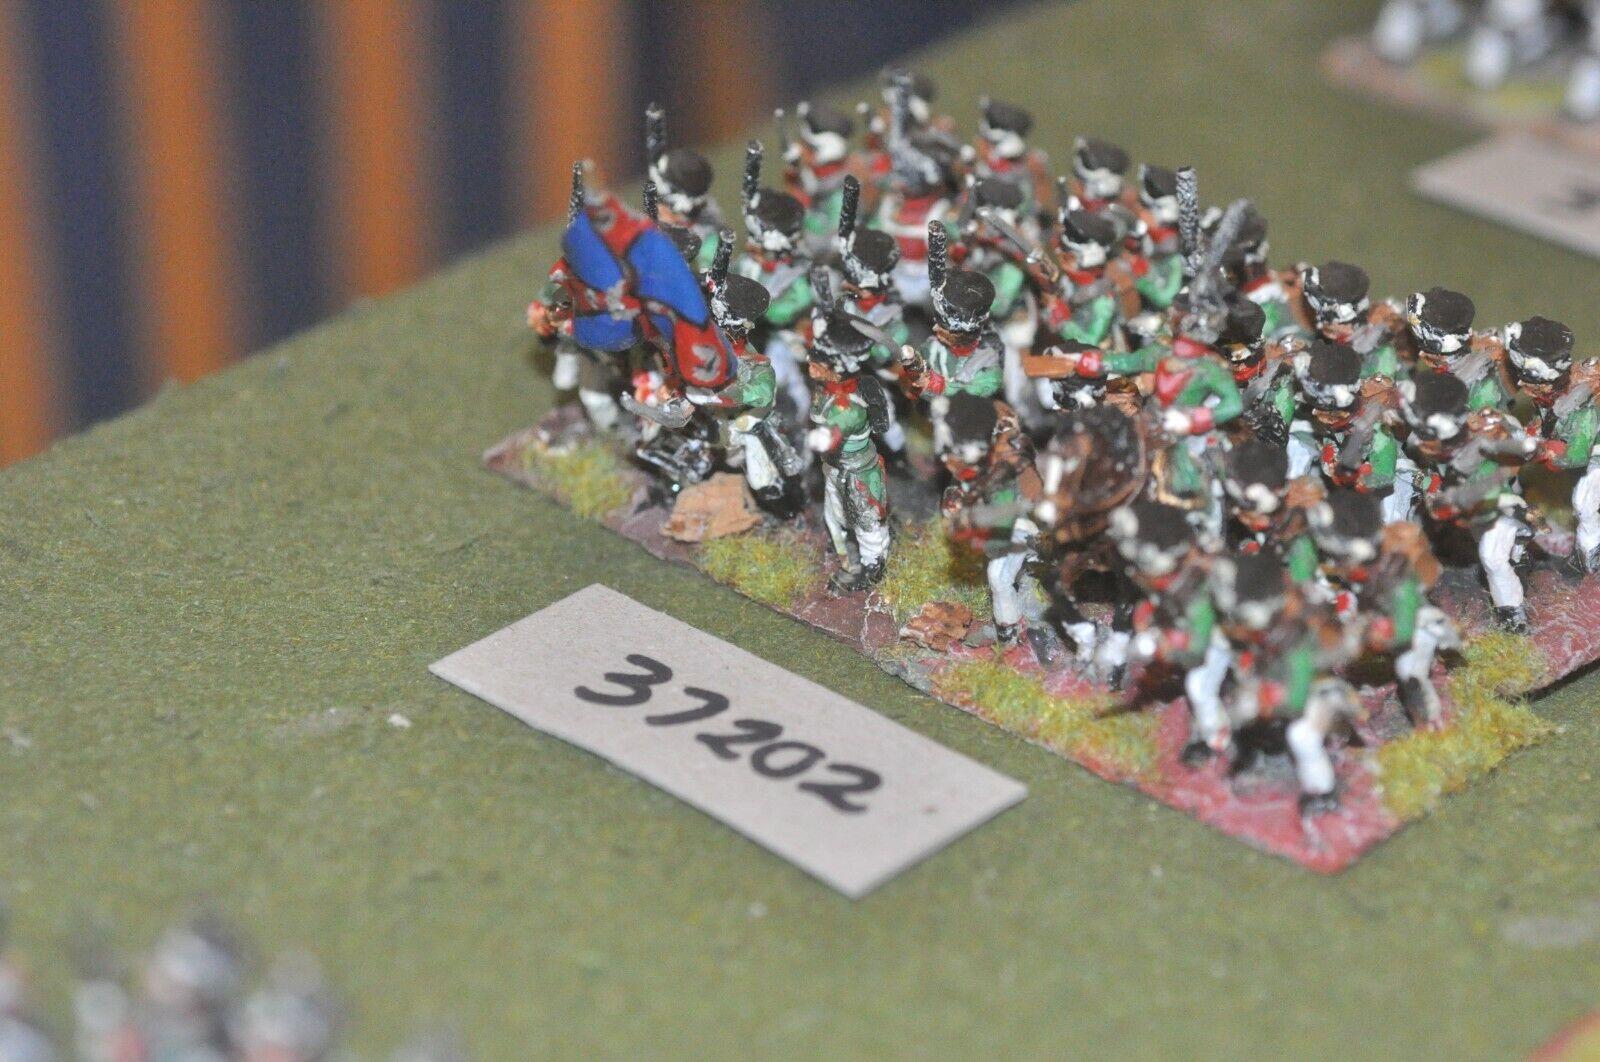 25mm napoleónicas ruso-Line 32 figuras-INF (37202)